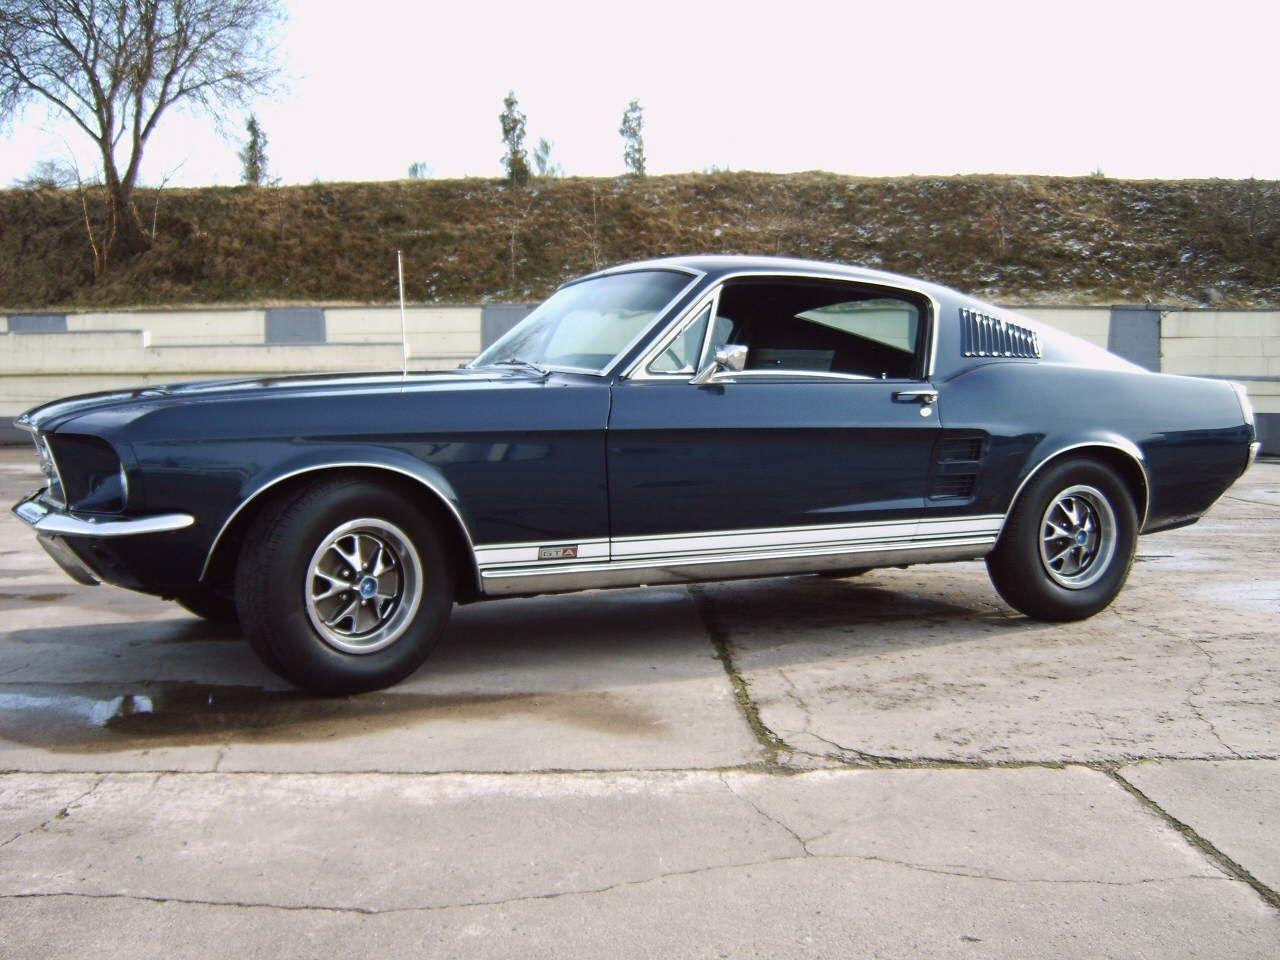 1967 Ford Mustang Pictures Mustang Ford Mustang Mustang Convertible